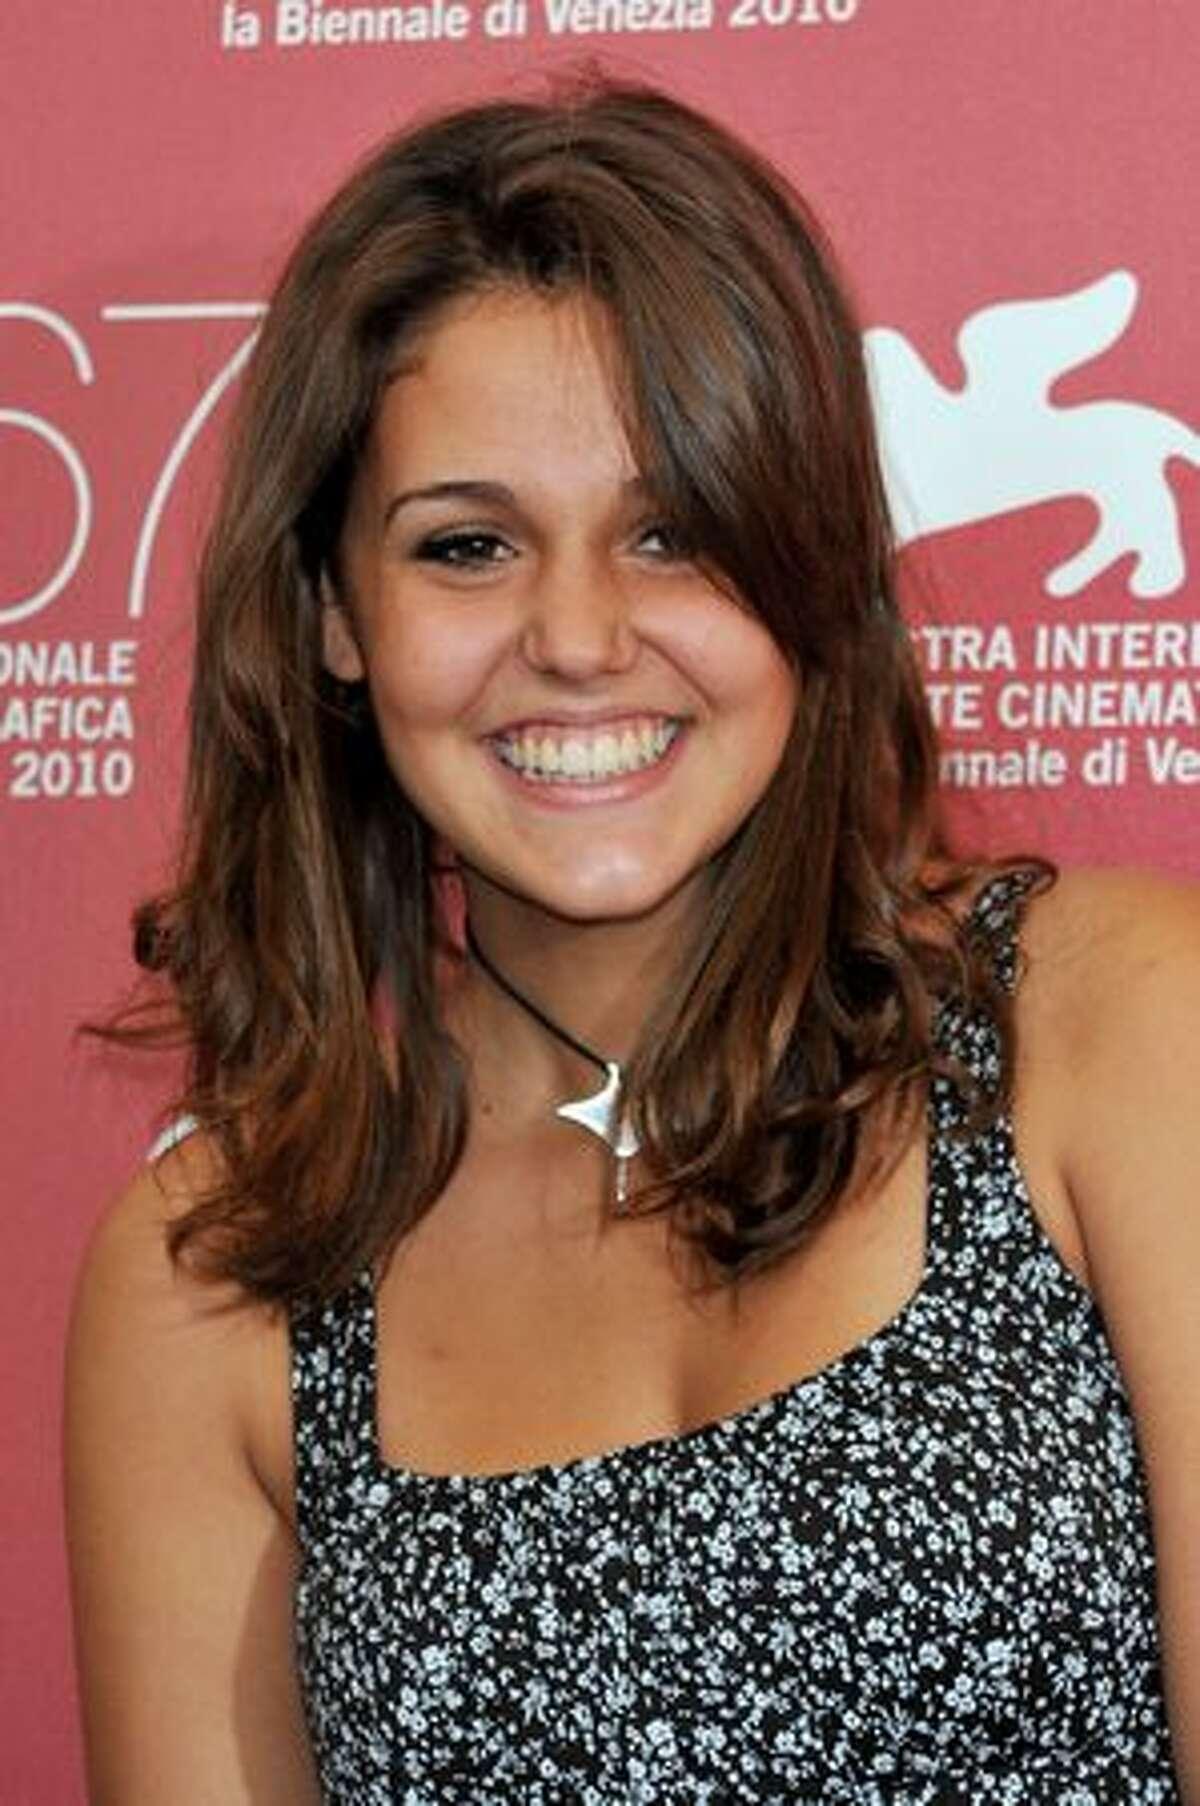 Actress Elenea Belocchio attends the